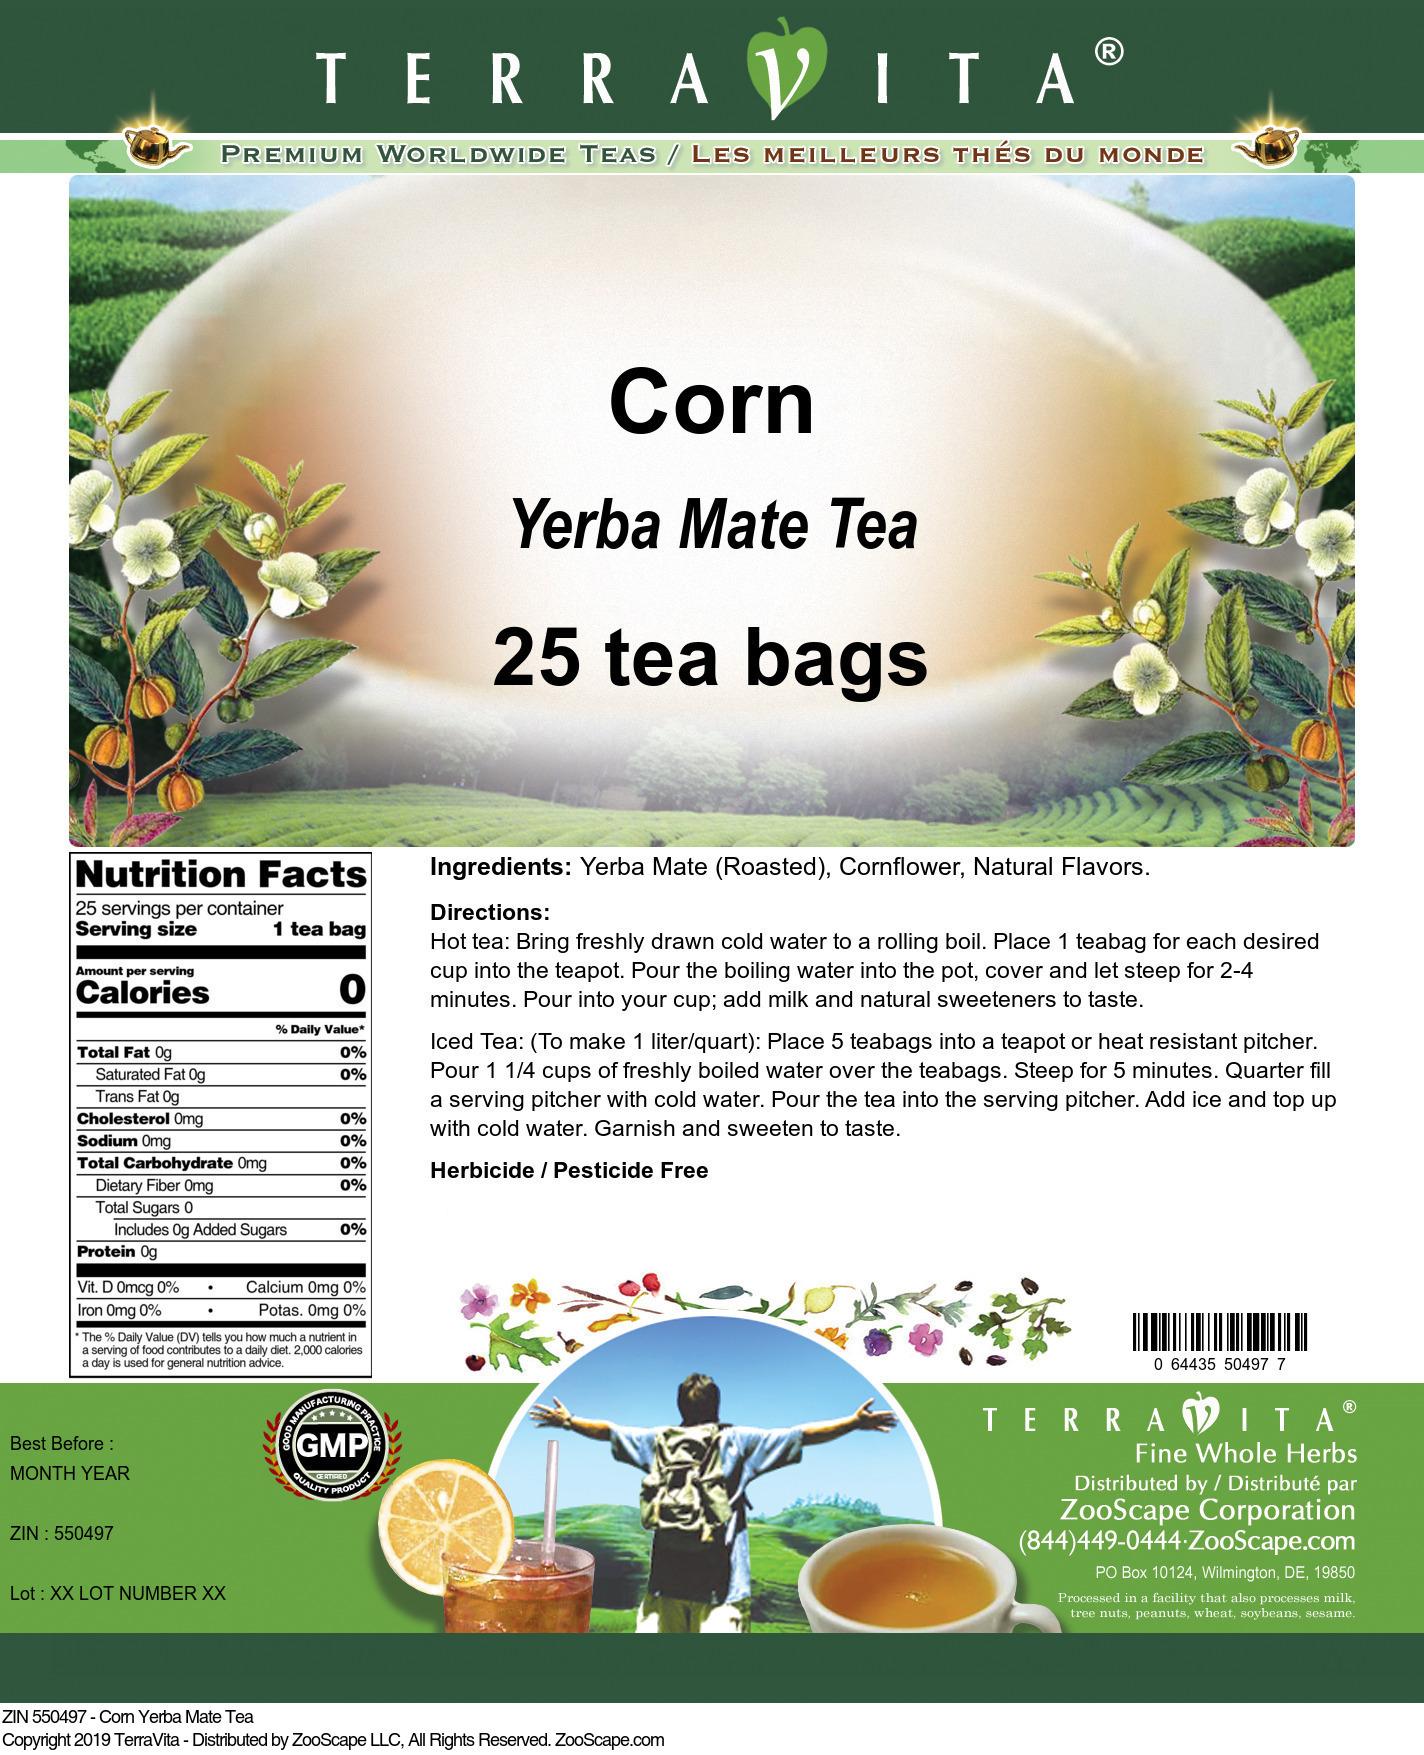 Corn Yerba Mate Tea